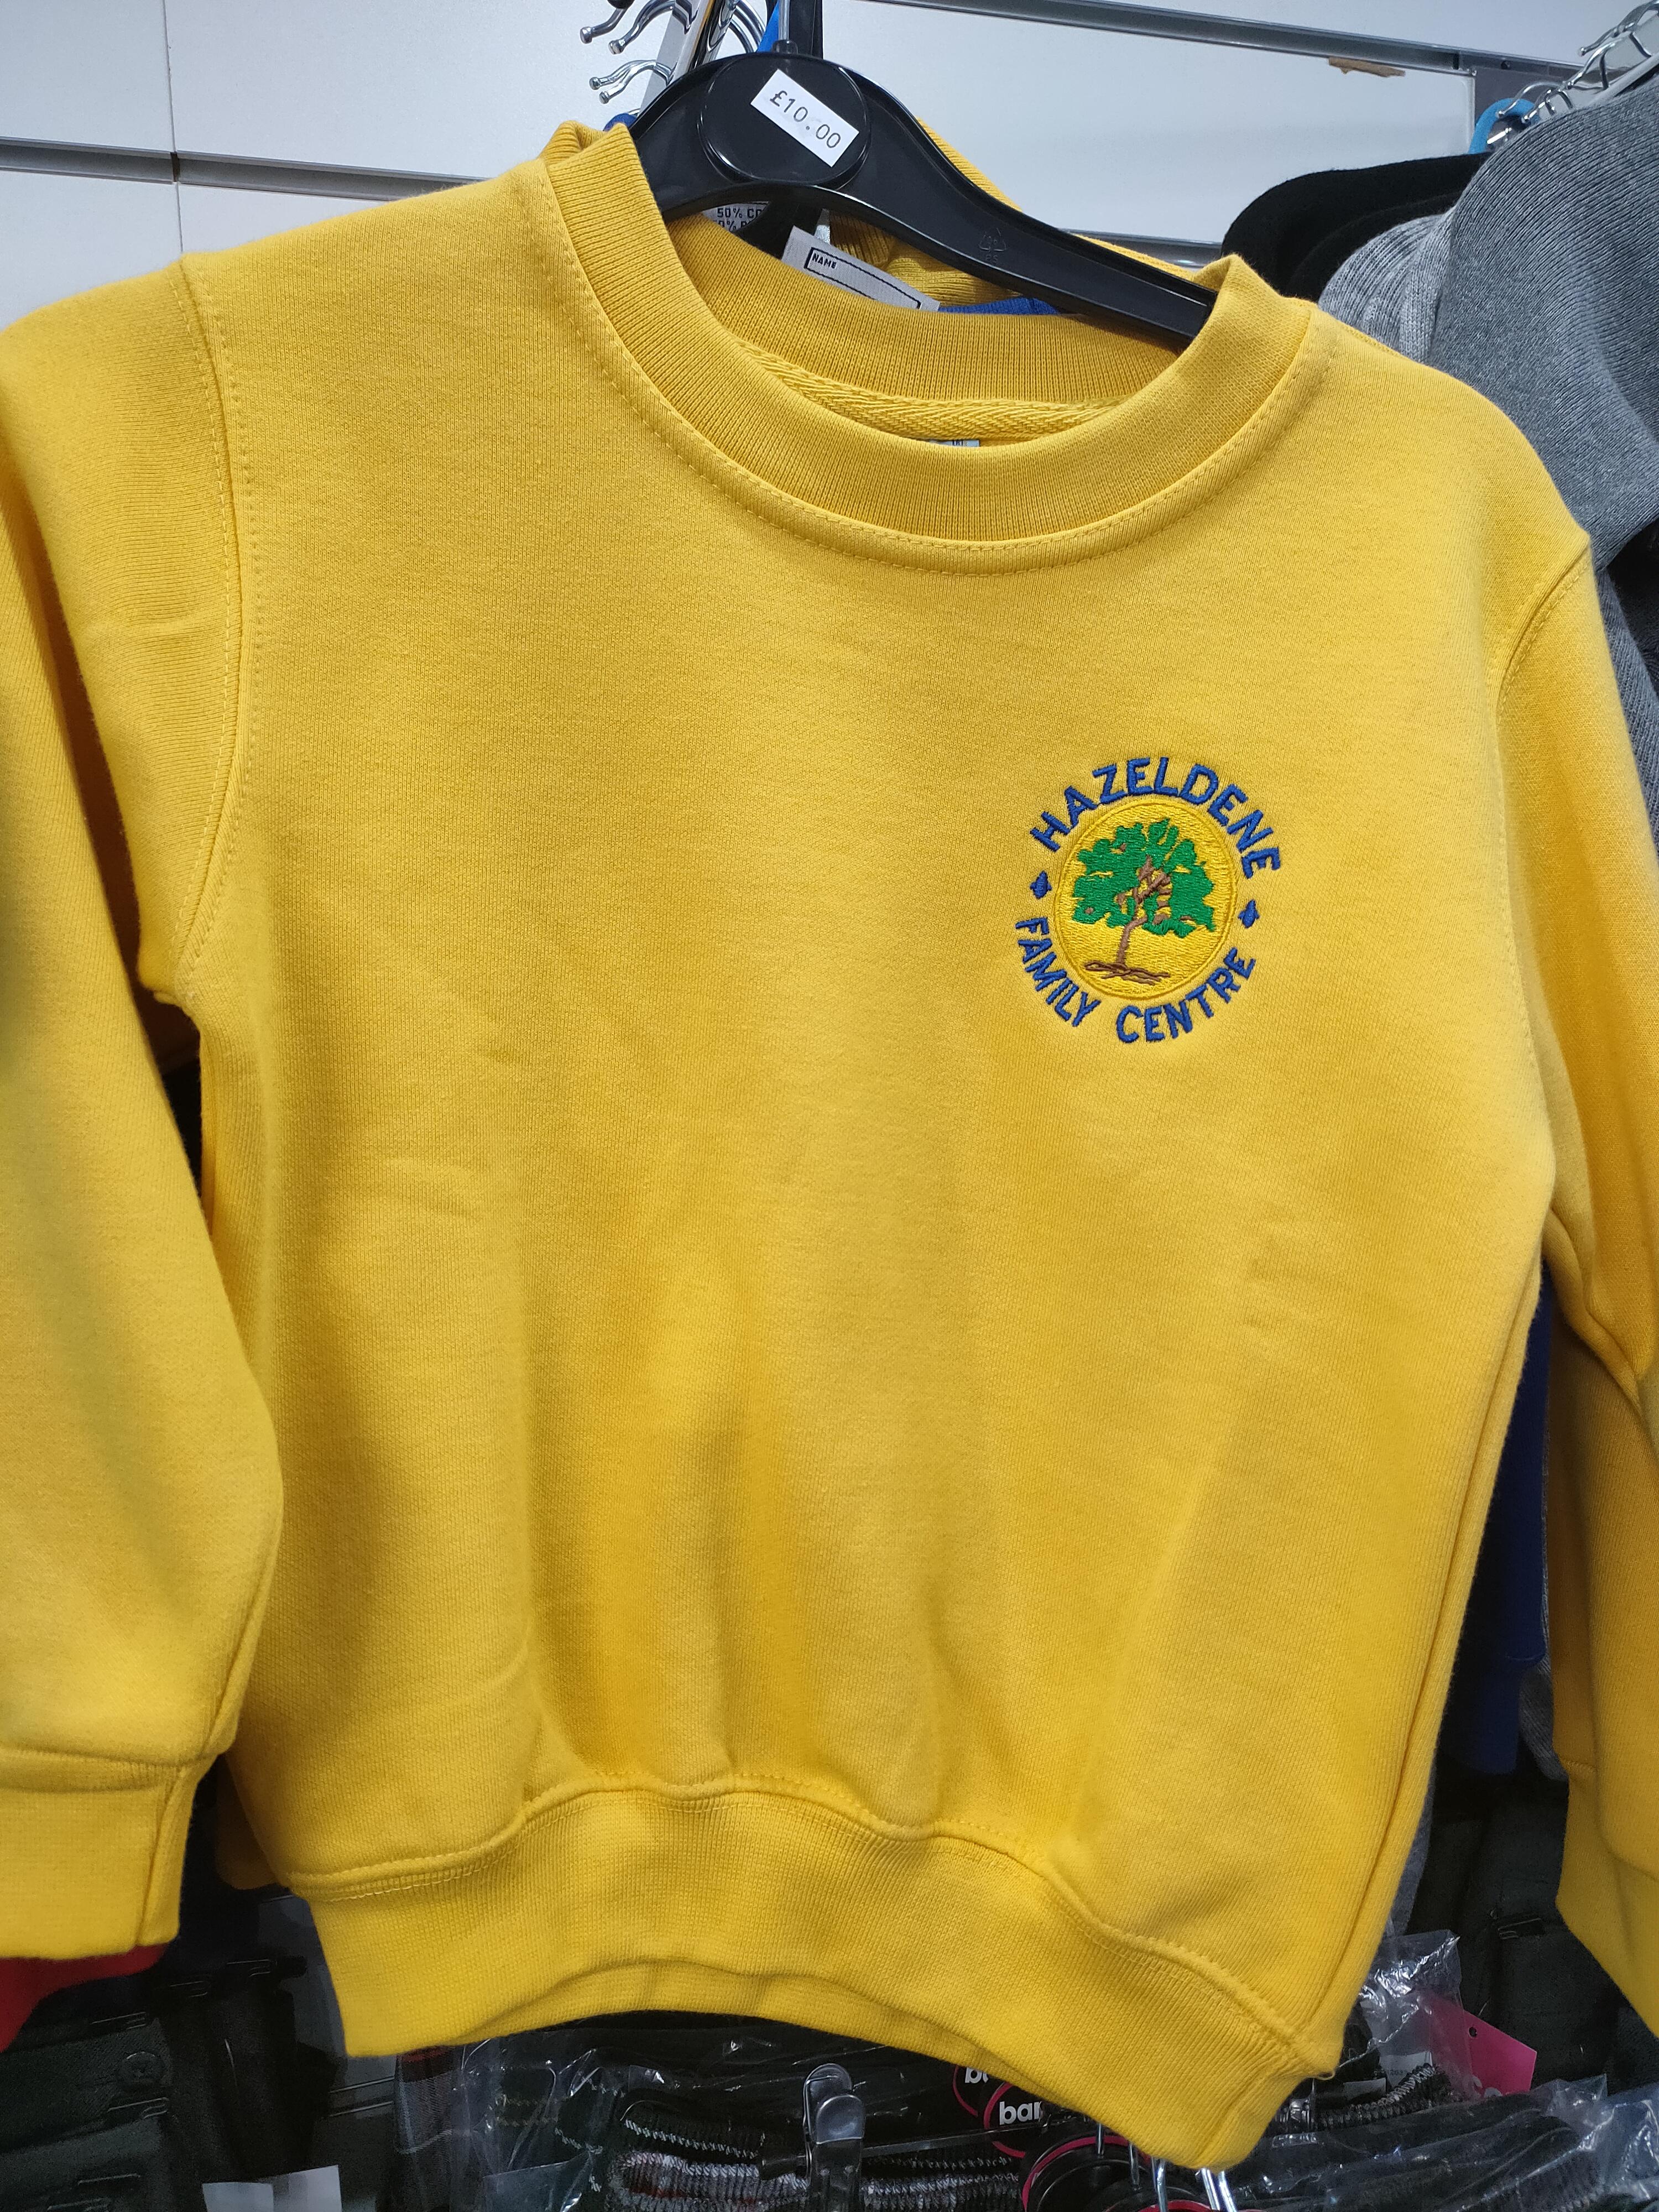 Hazeldene Family Centre Round Neck Sweatshirt (Gold)